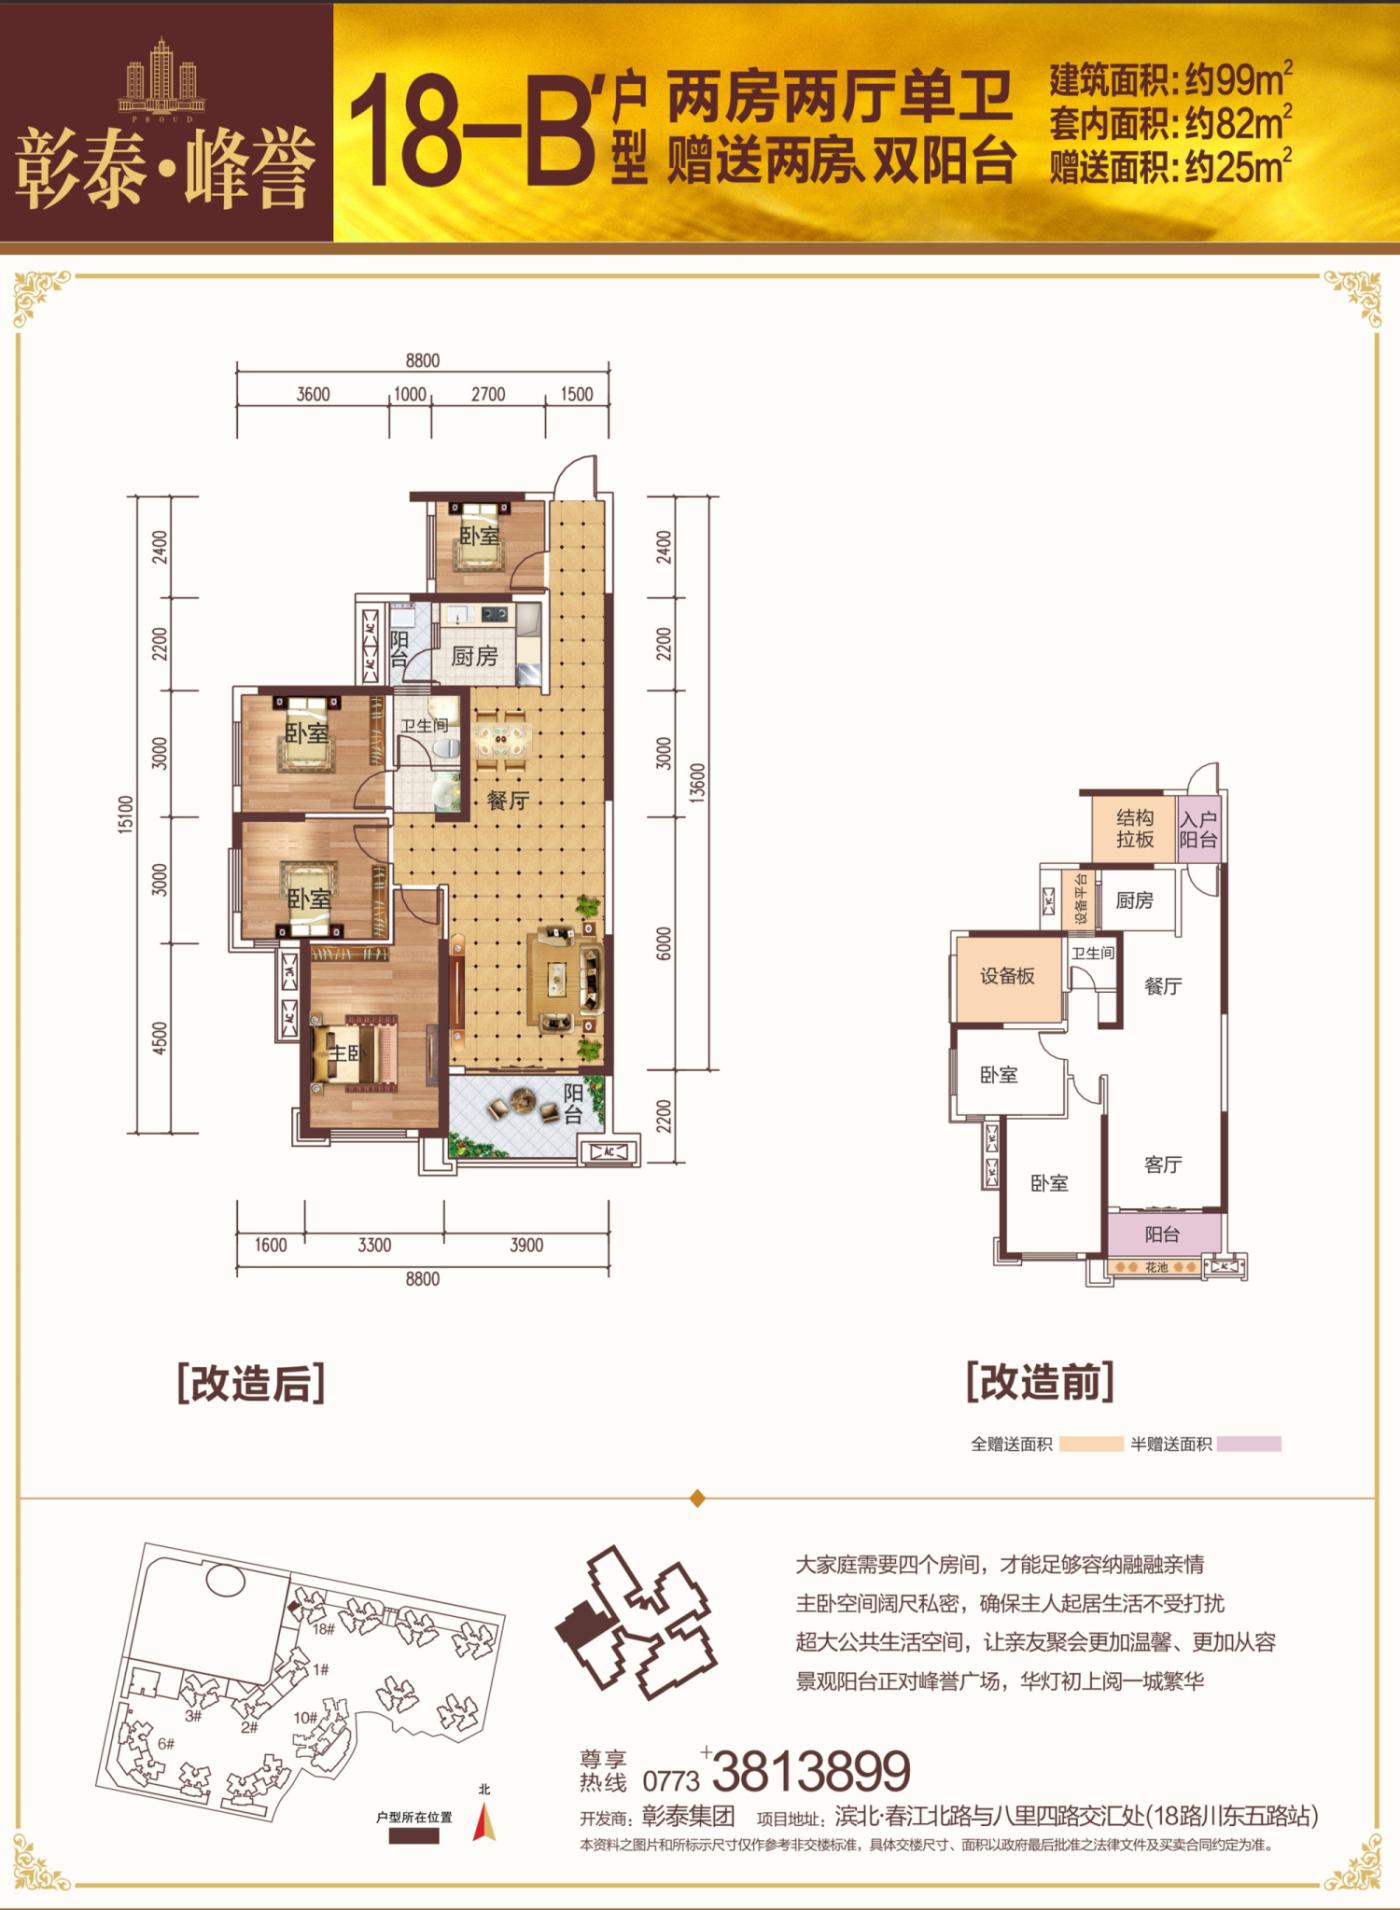 18-B两房两厅单卫